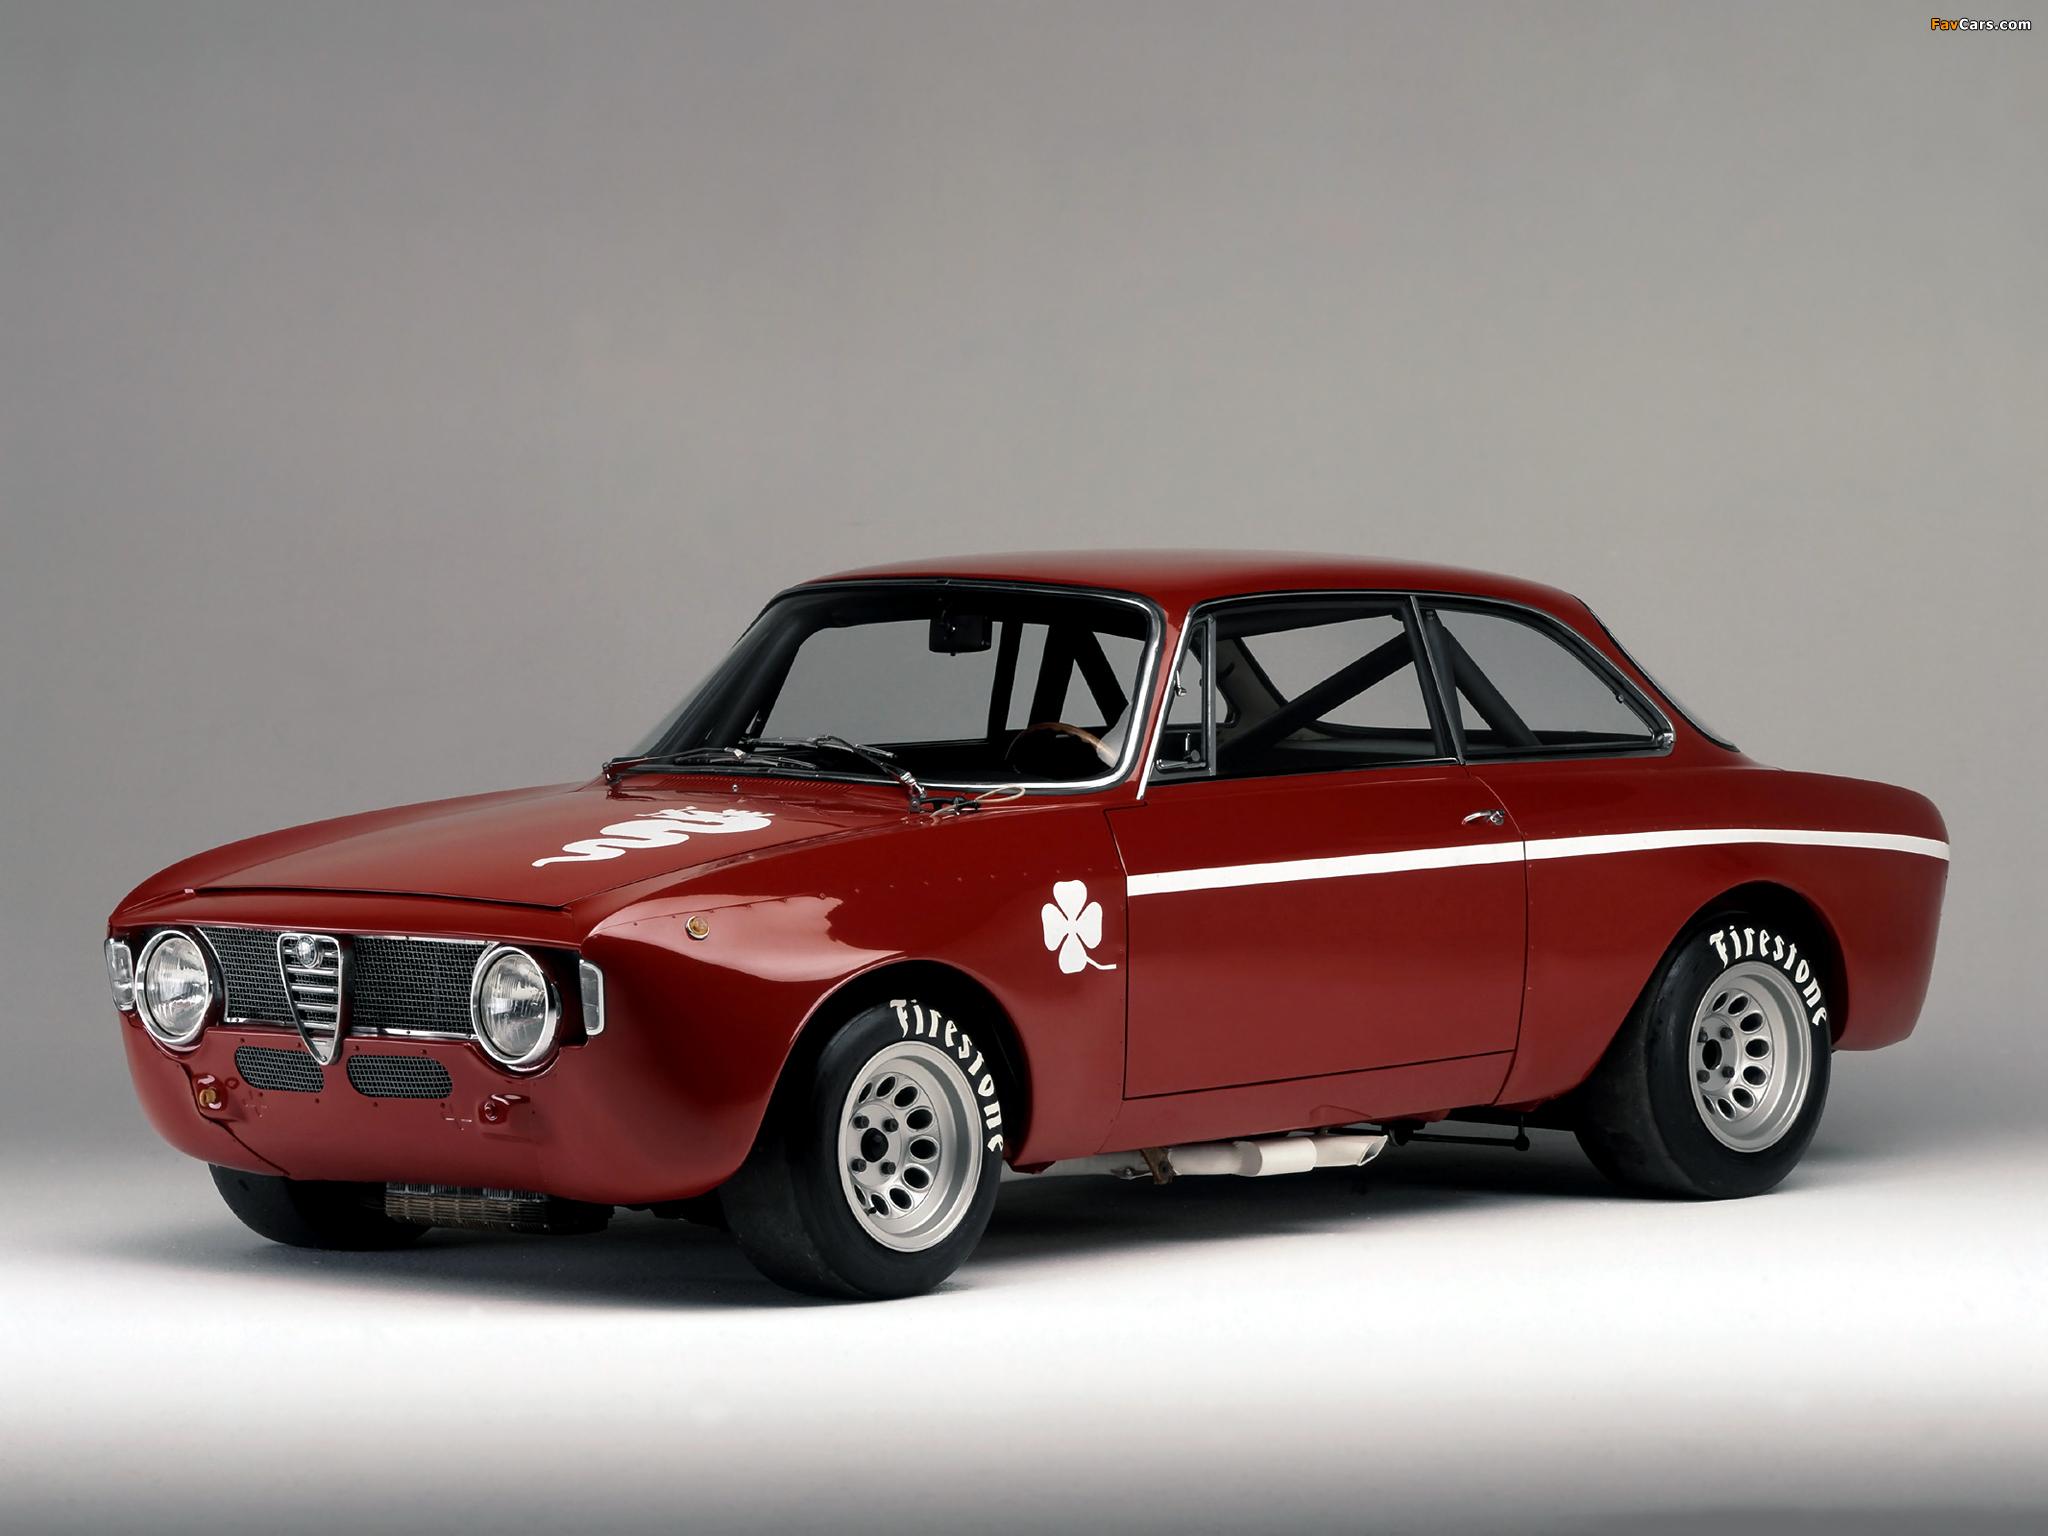 Most Viewed Alfa Romeo Gta Wallpapers 4k Wallpapers